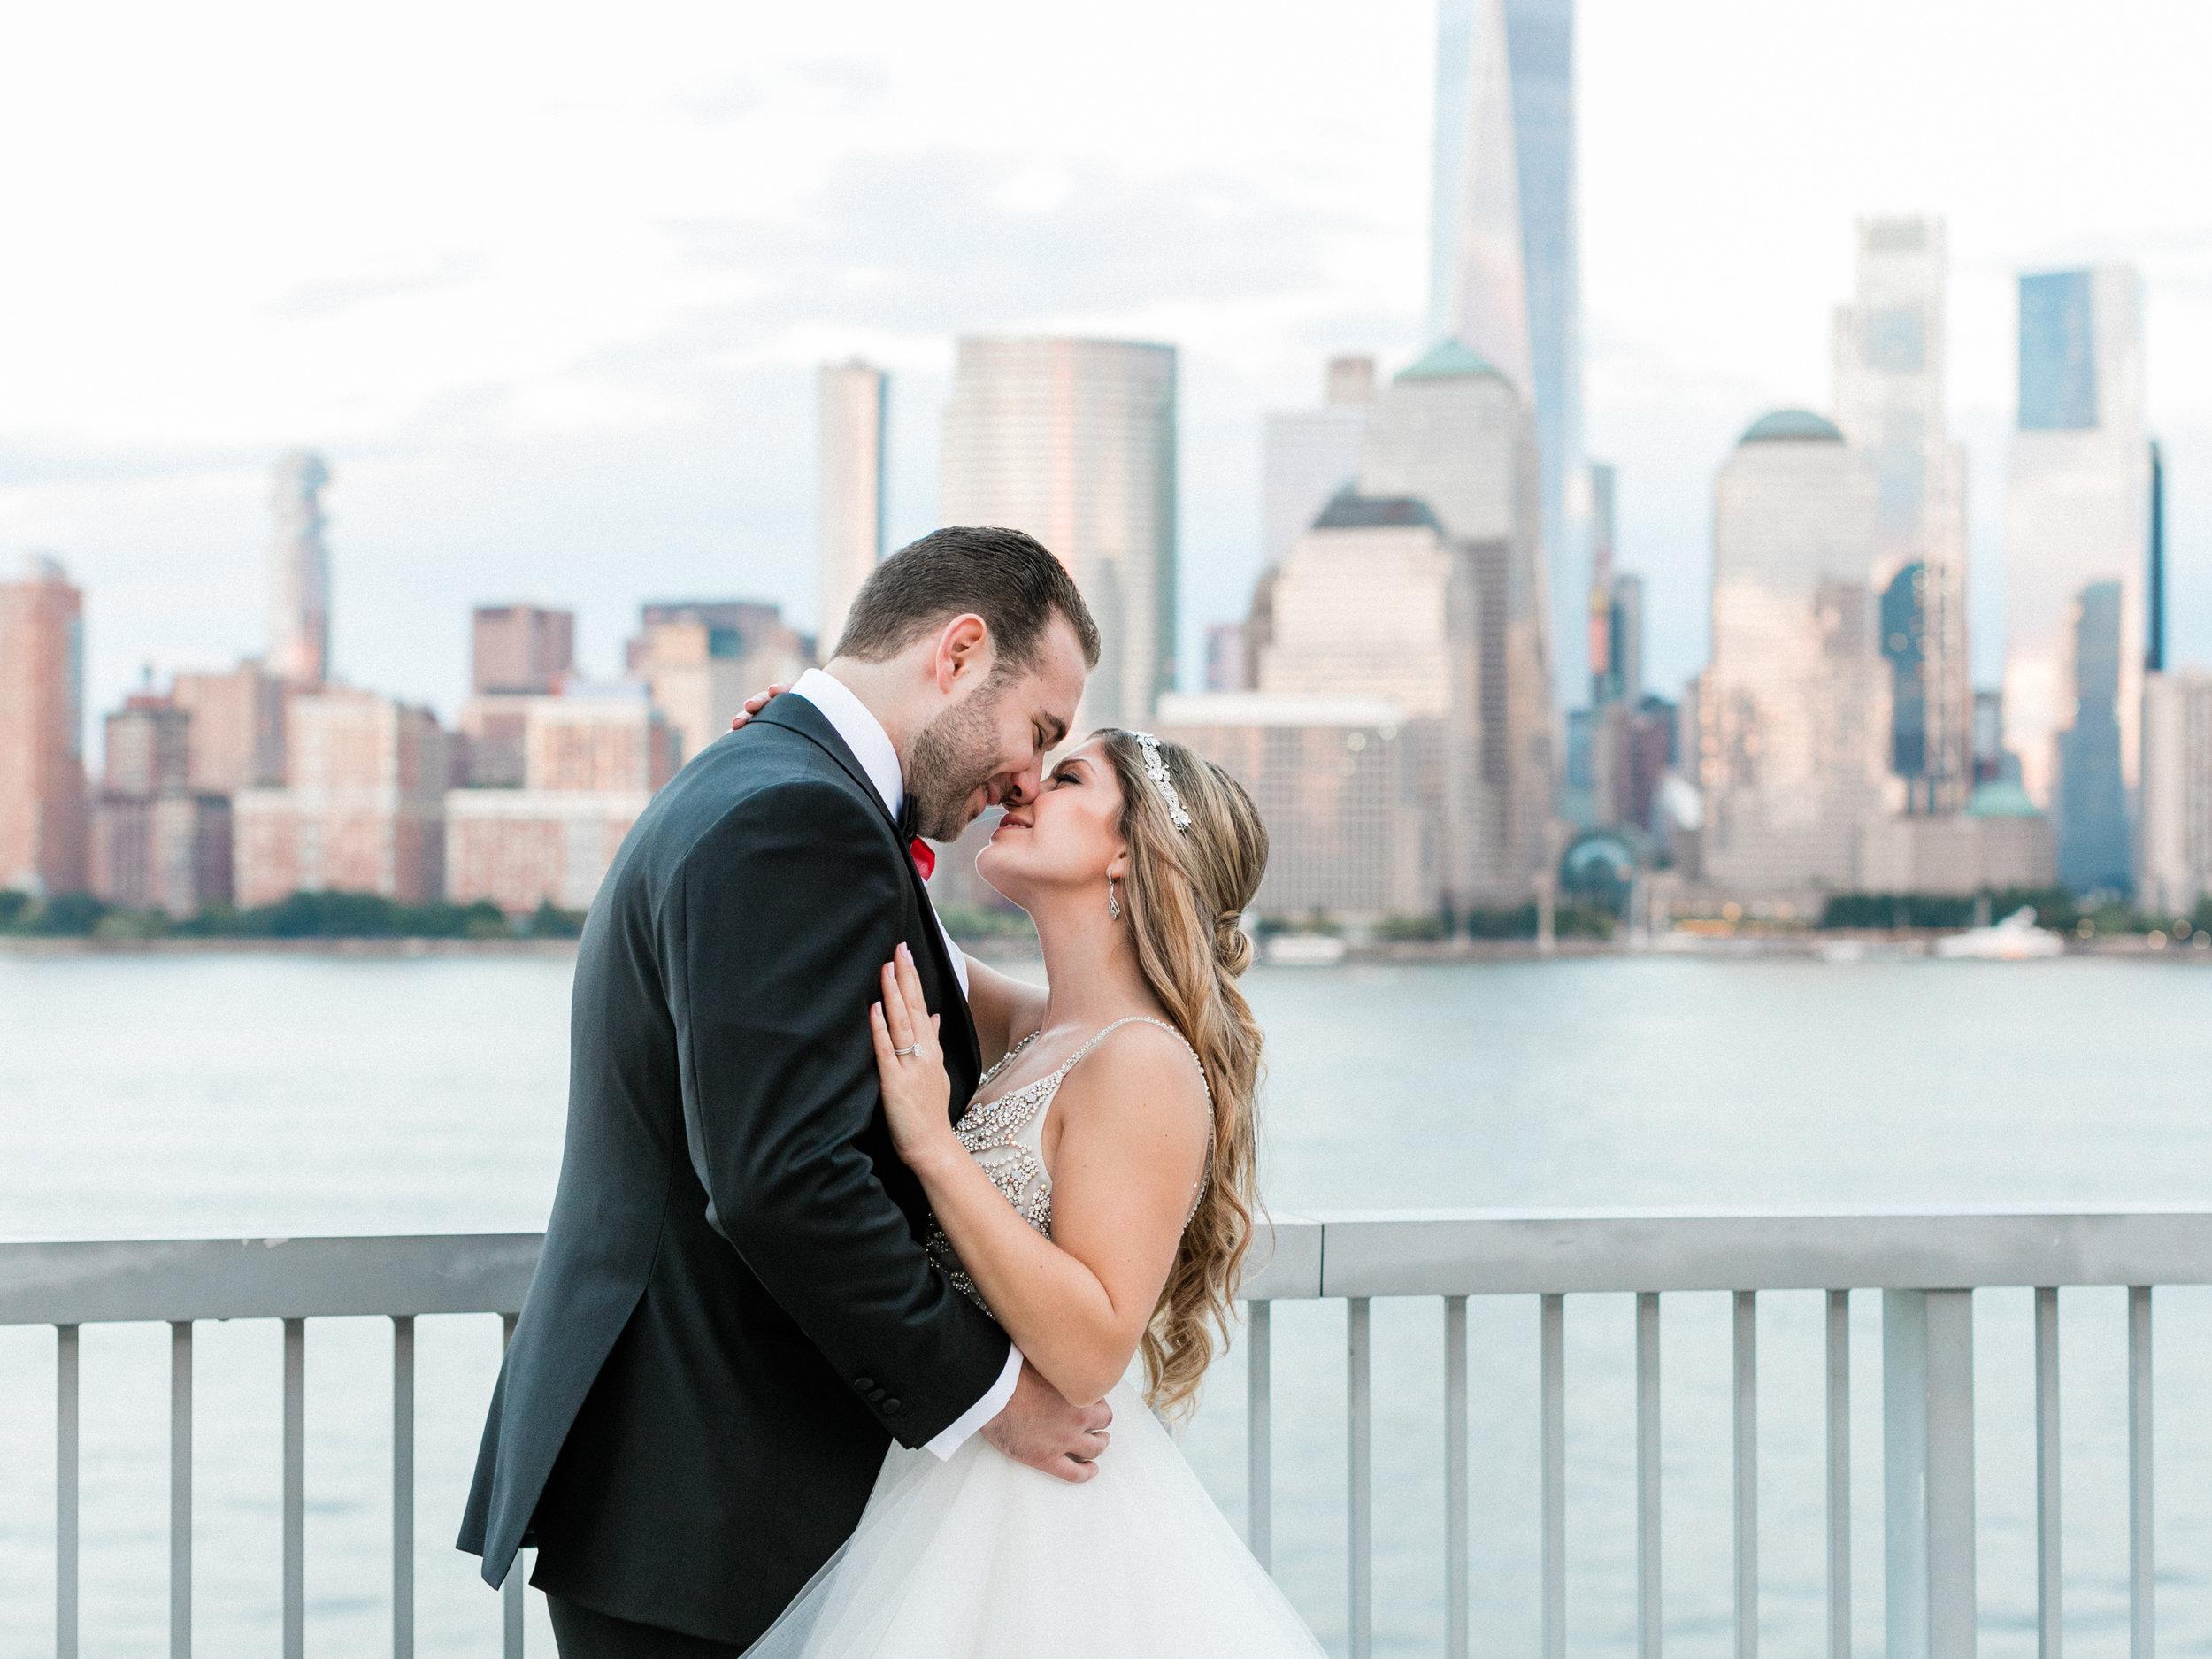 hyatt-regency-jersey-city-wedding-photographer61.jpg